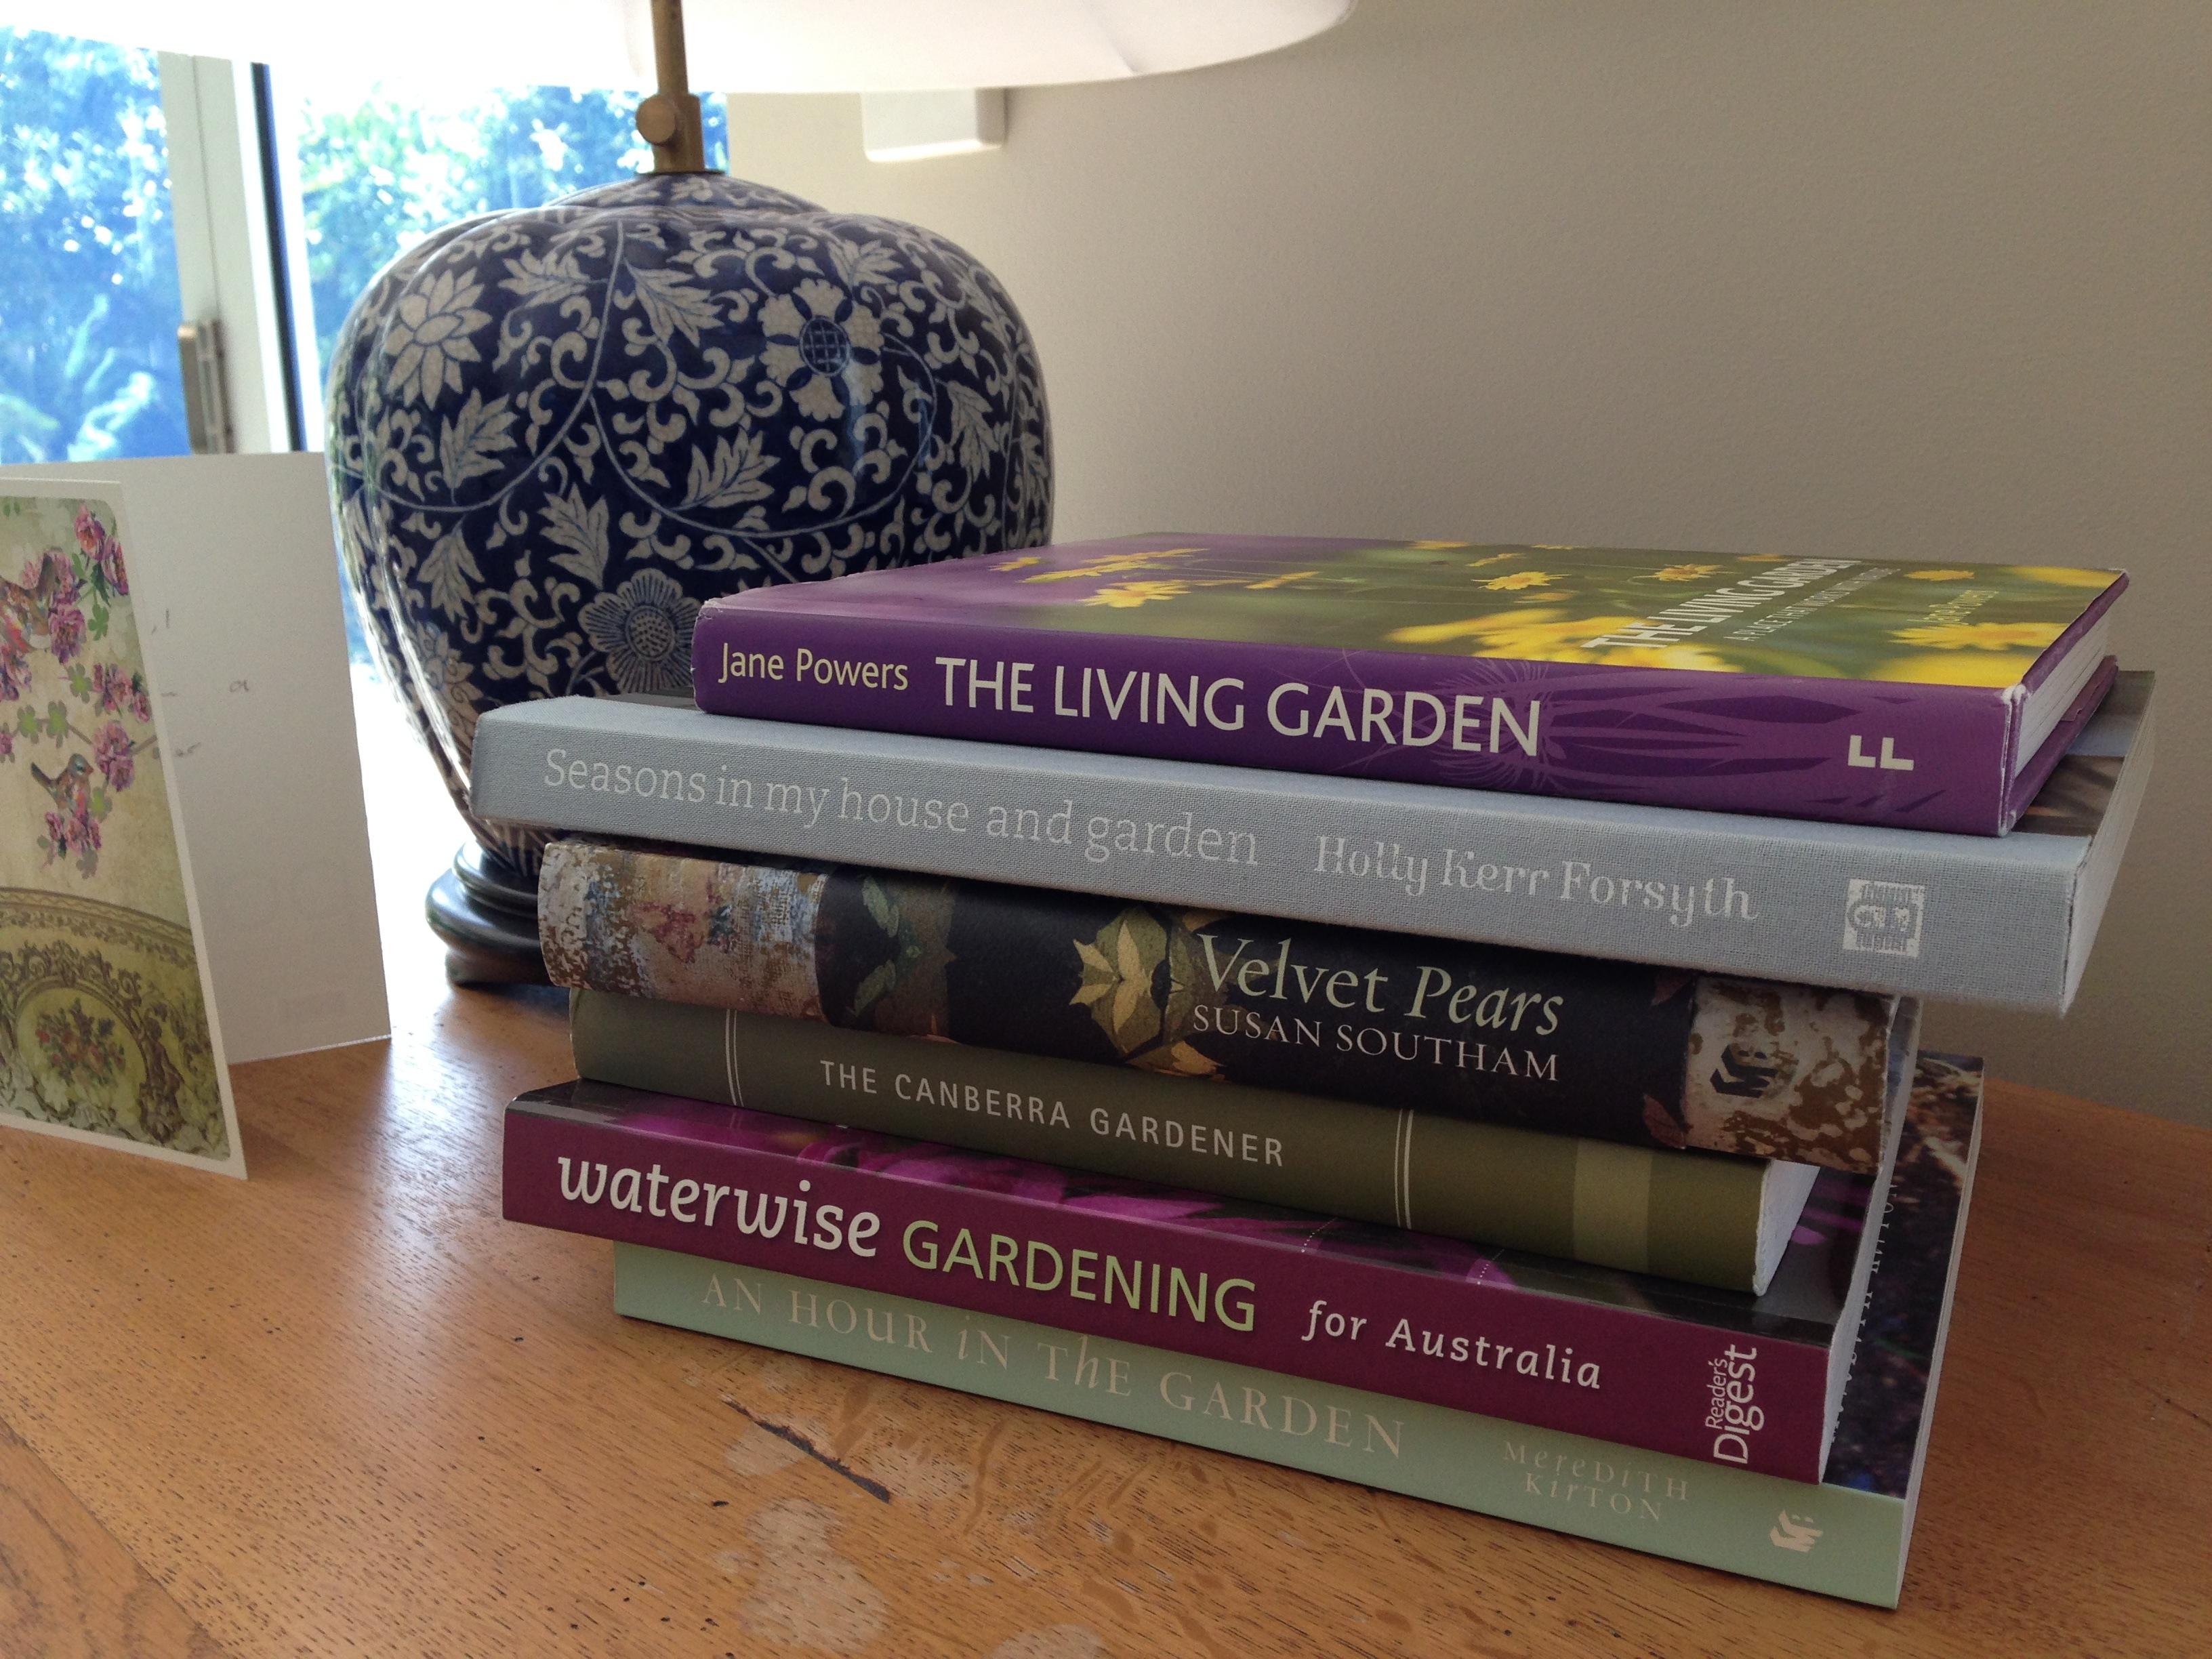 Top 5 Christmas Gardening Books Janna Schreier Garden Design